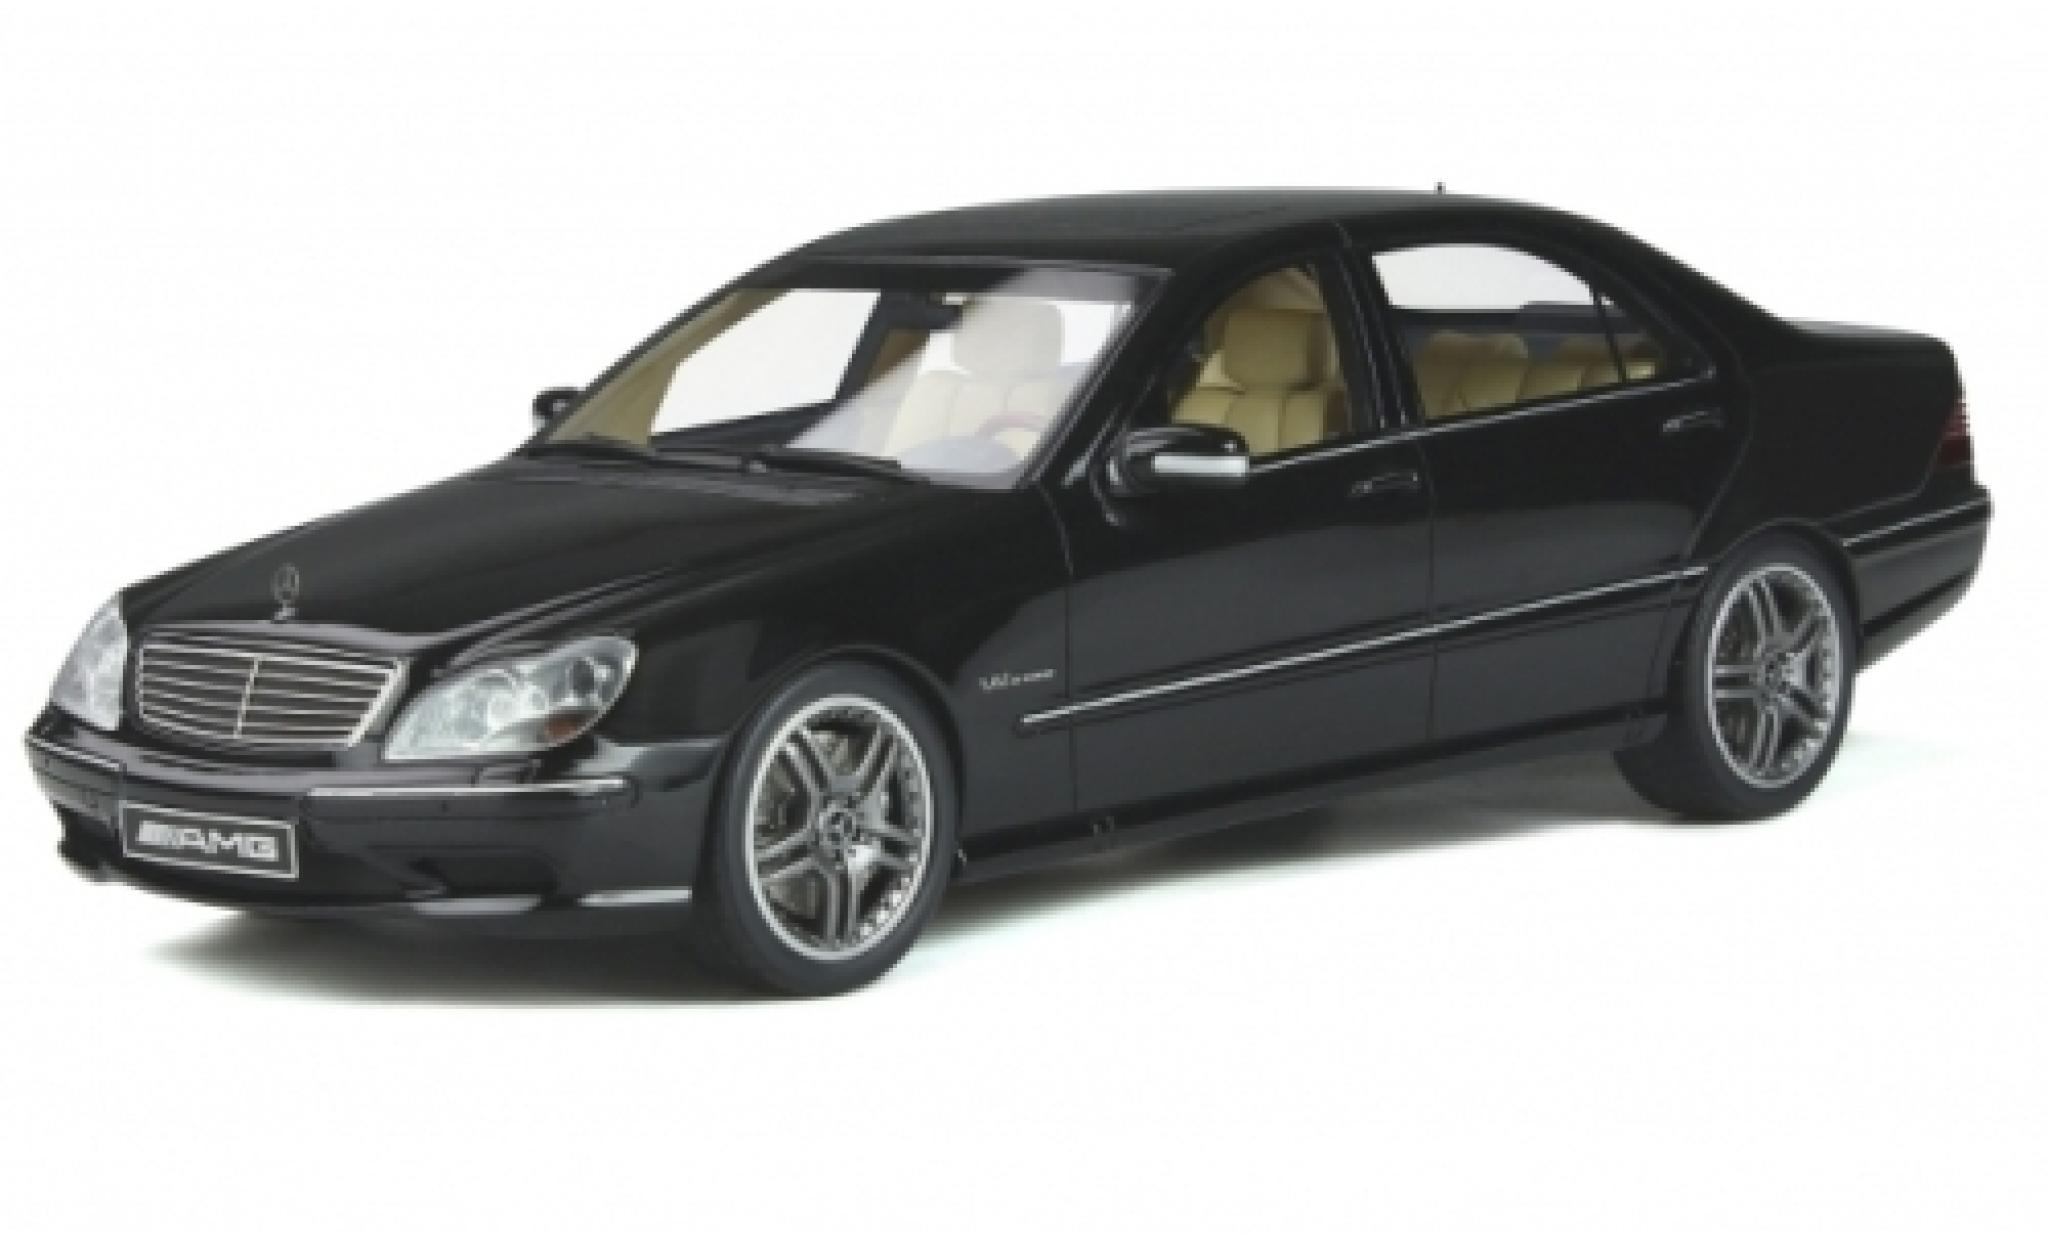 Mercedes Classe S 1/18 Ottomobile S 65 AMG (W220) metallise black 2004